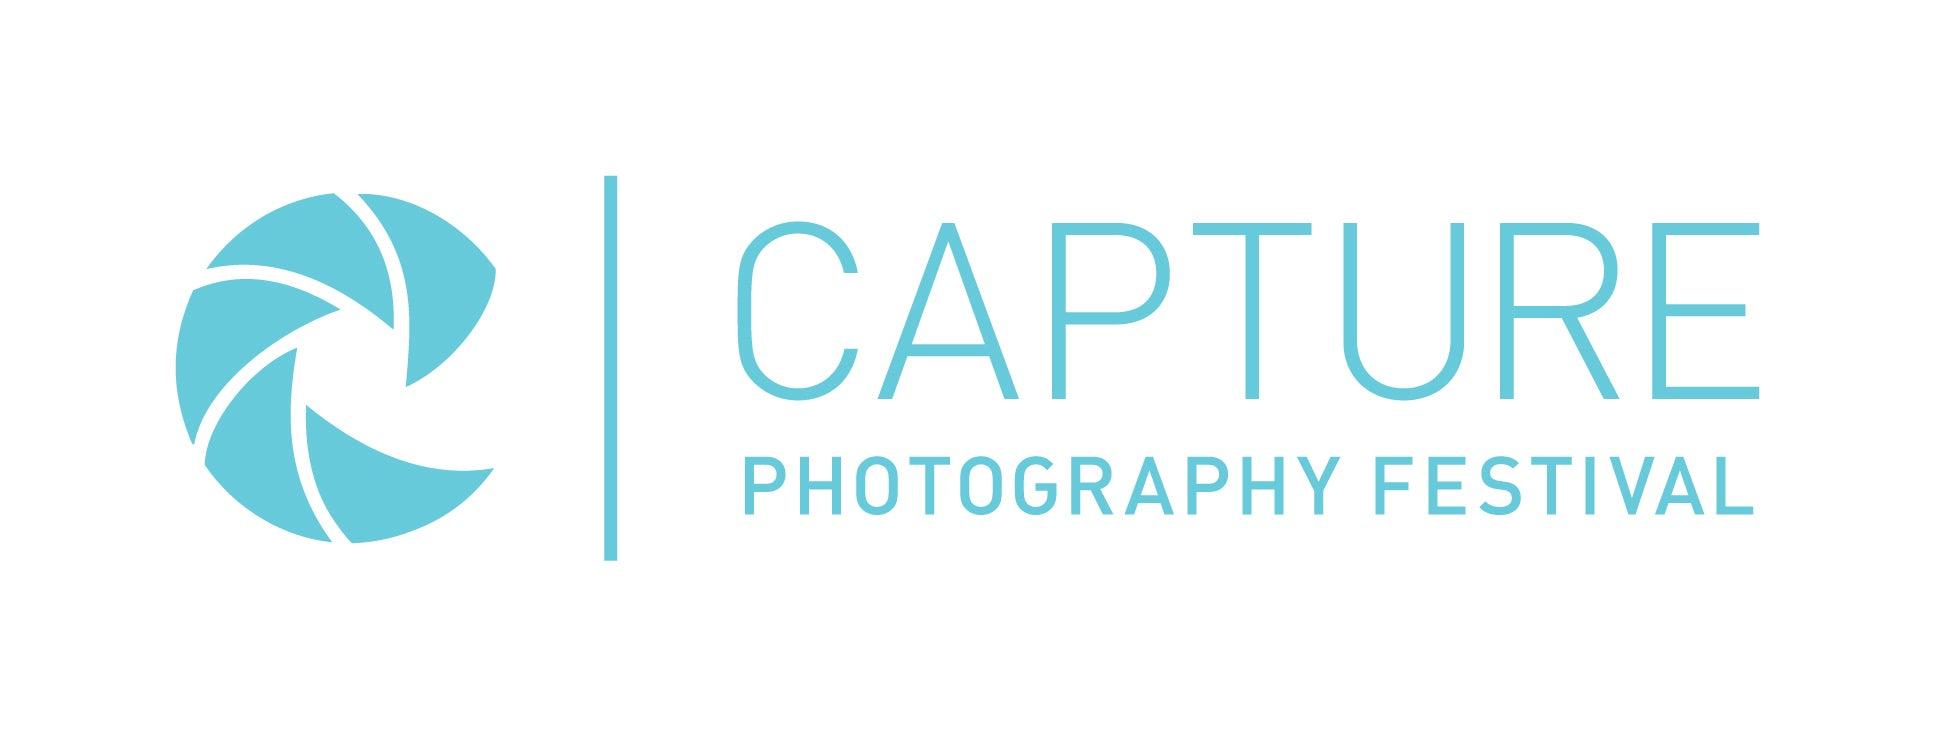 Capture Photography Festival Society